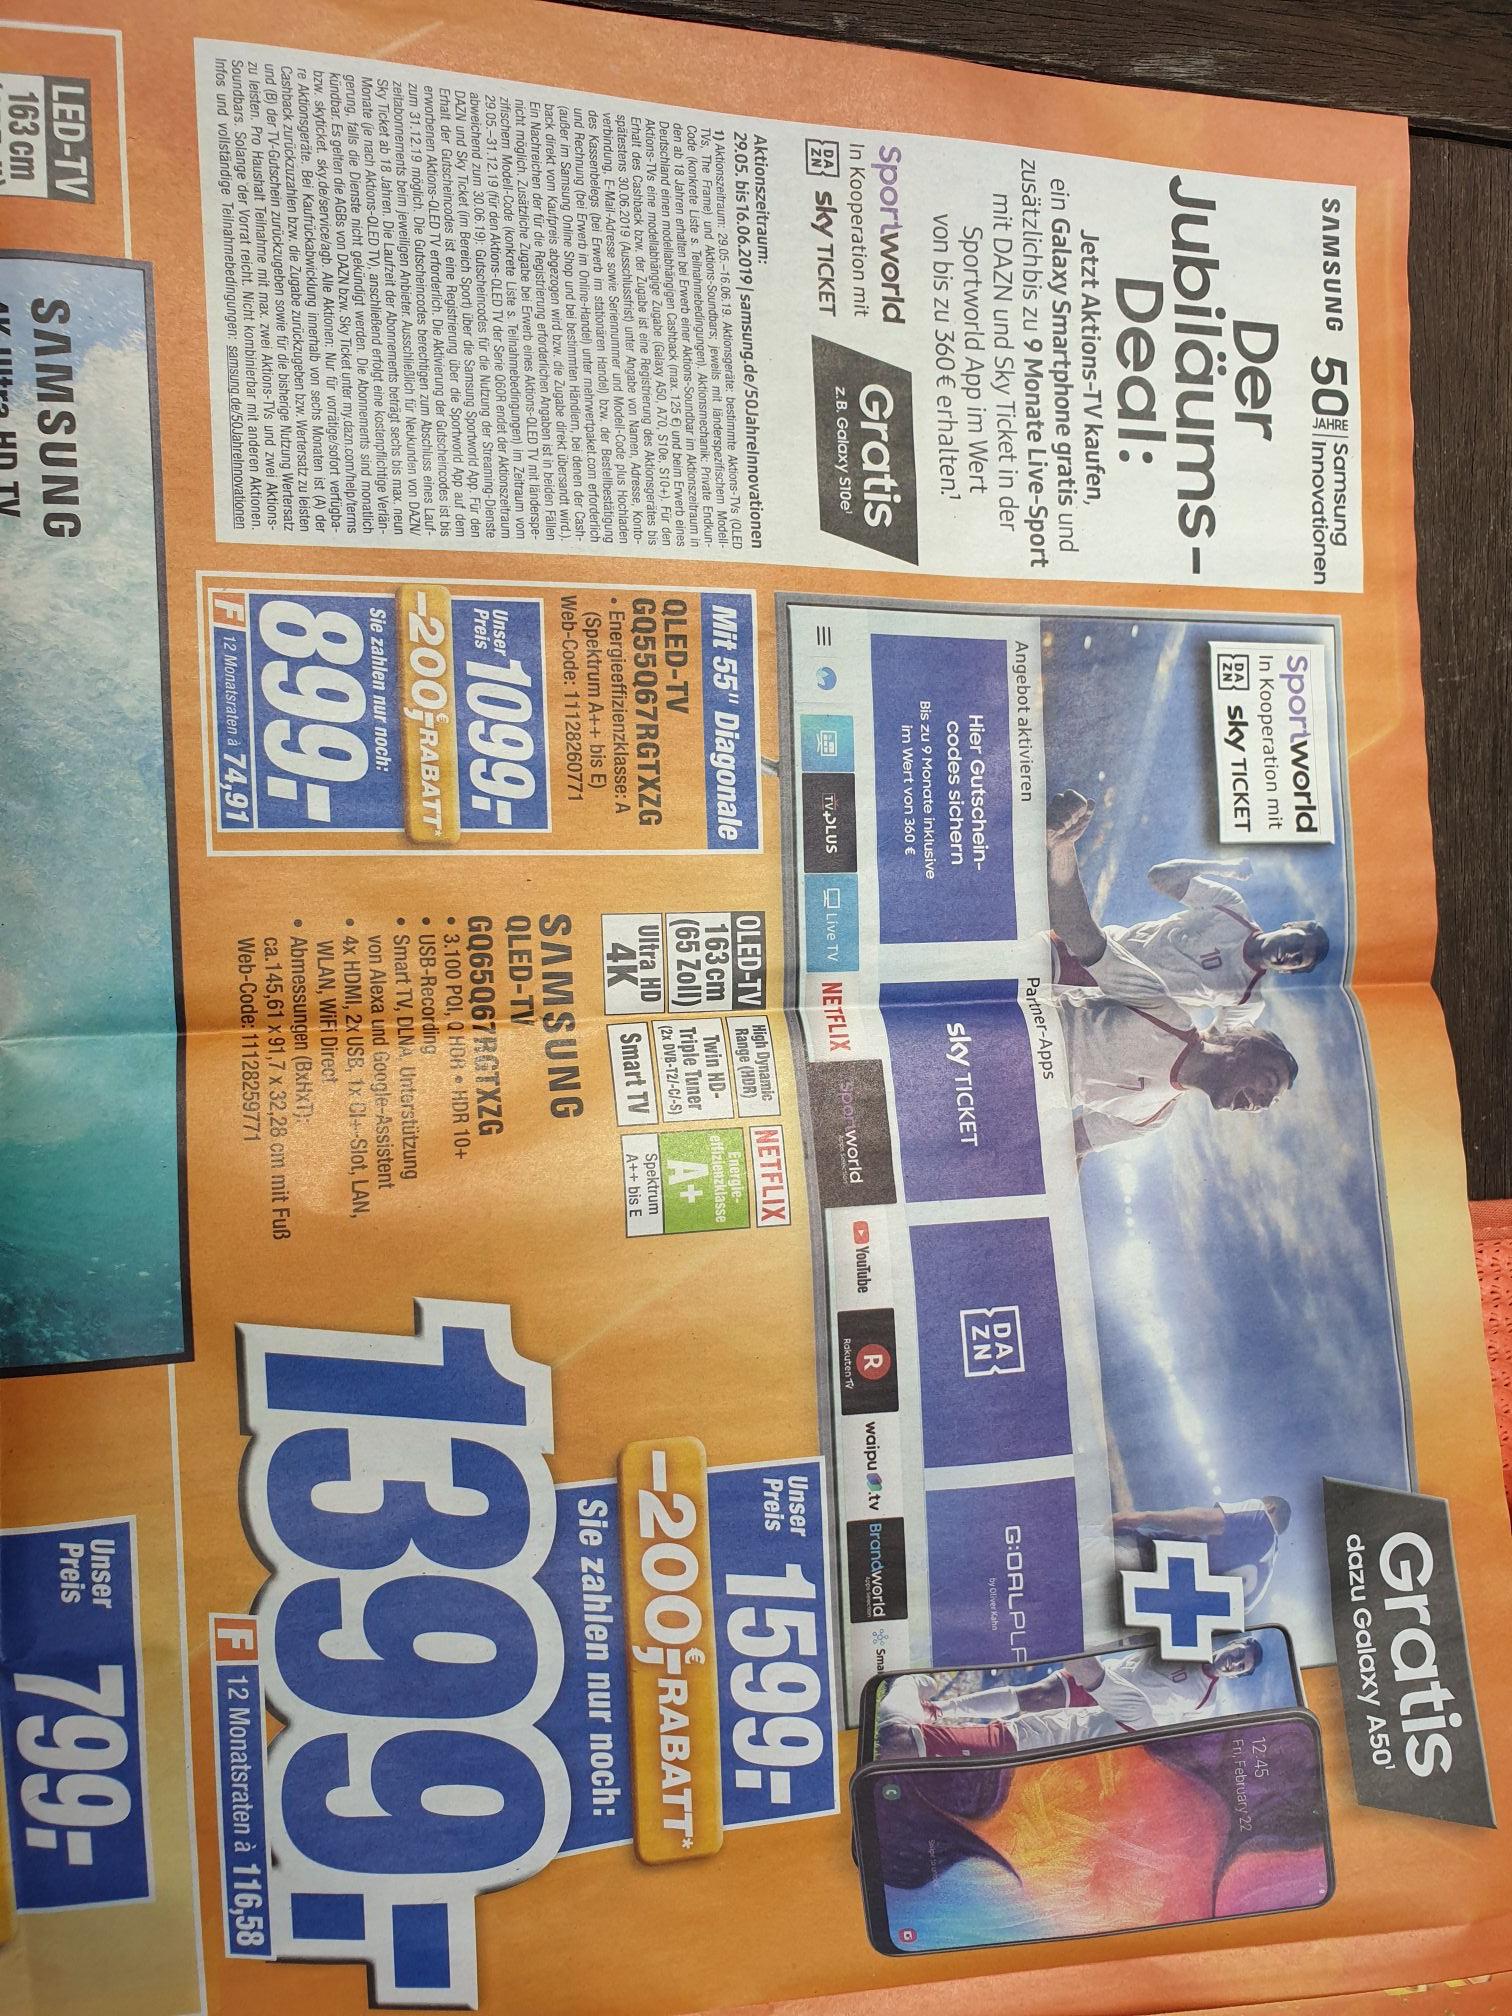 (Lokal) Samsung Qled-TV GQ 65 Q67RGT + Smartphone Galaxy A50 + 9 Monate Live-Sport 1399€, 55 Zoll 899€